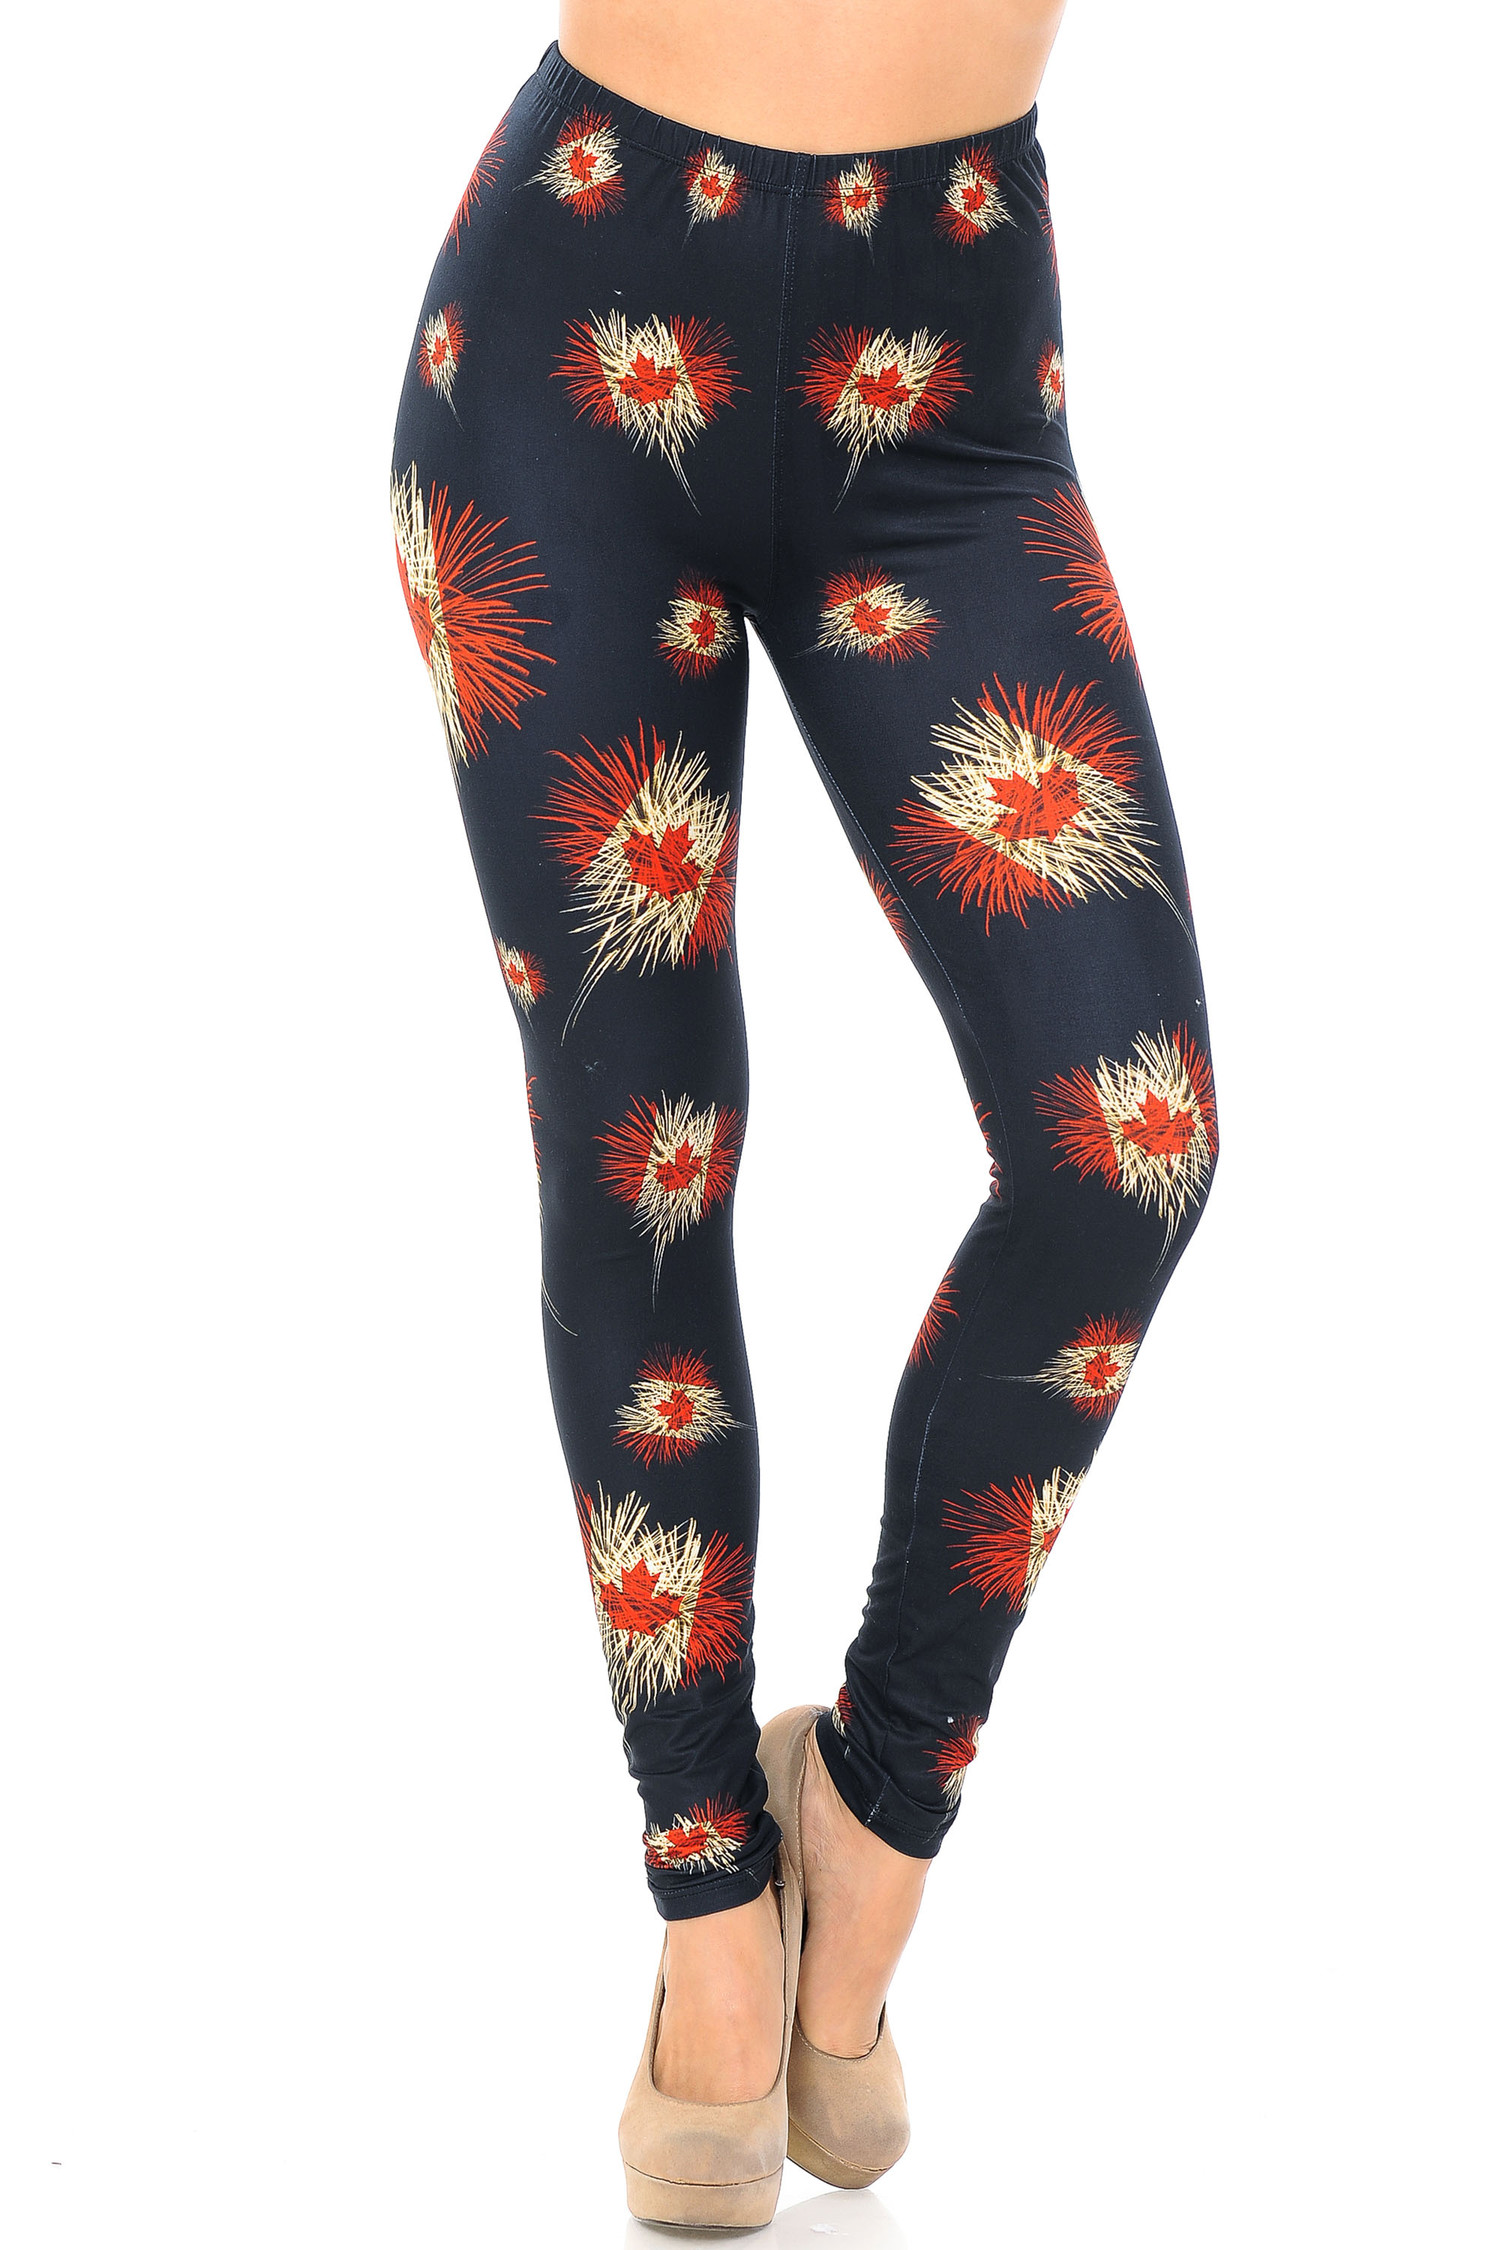 Creamy Soft Canadian Flag Fireworks Extra Plus Size Leggings - 3X-5X - USA Fashion™